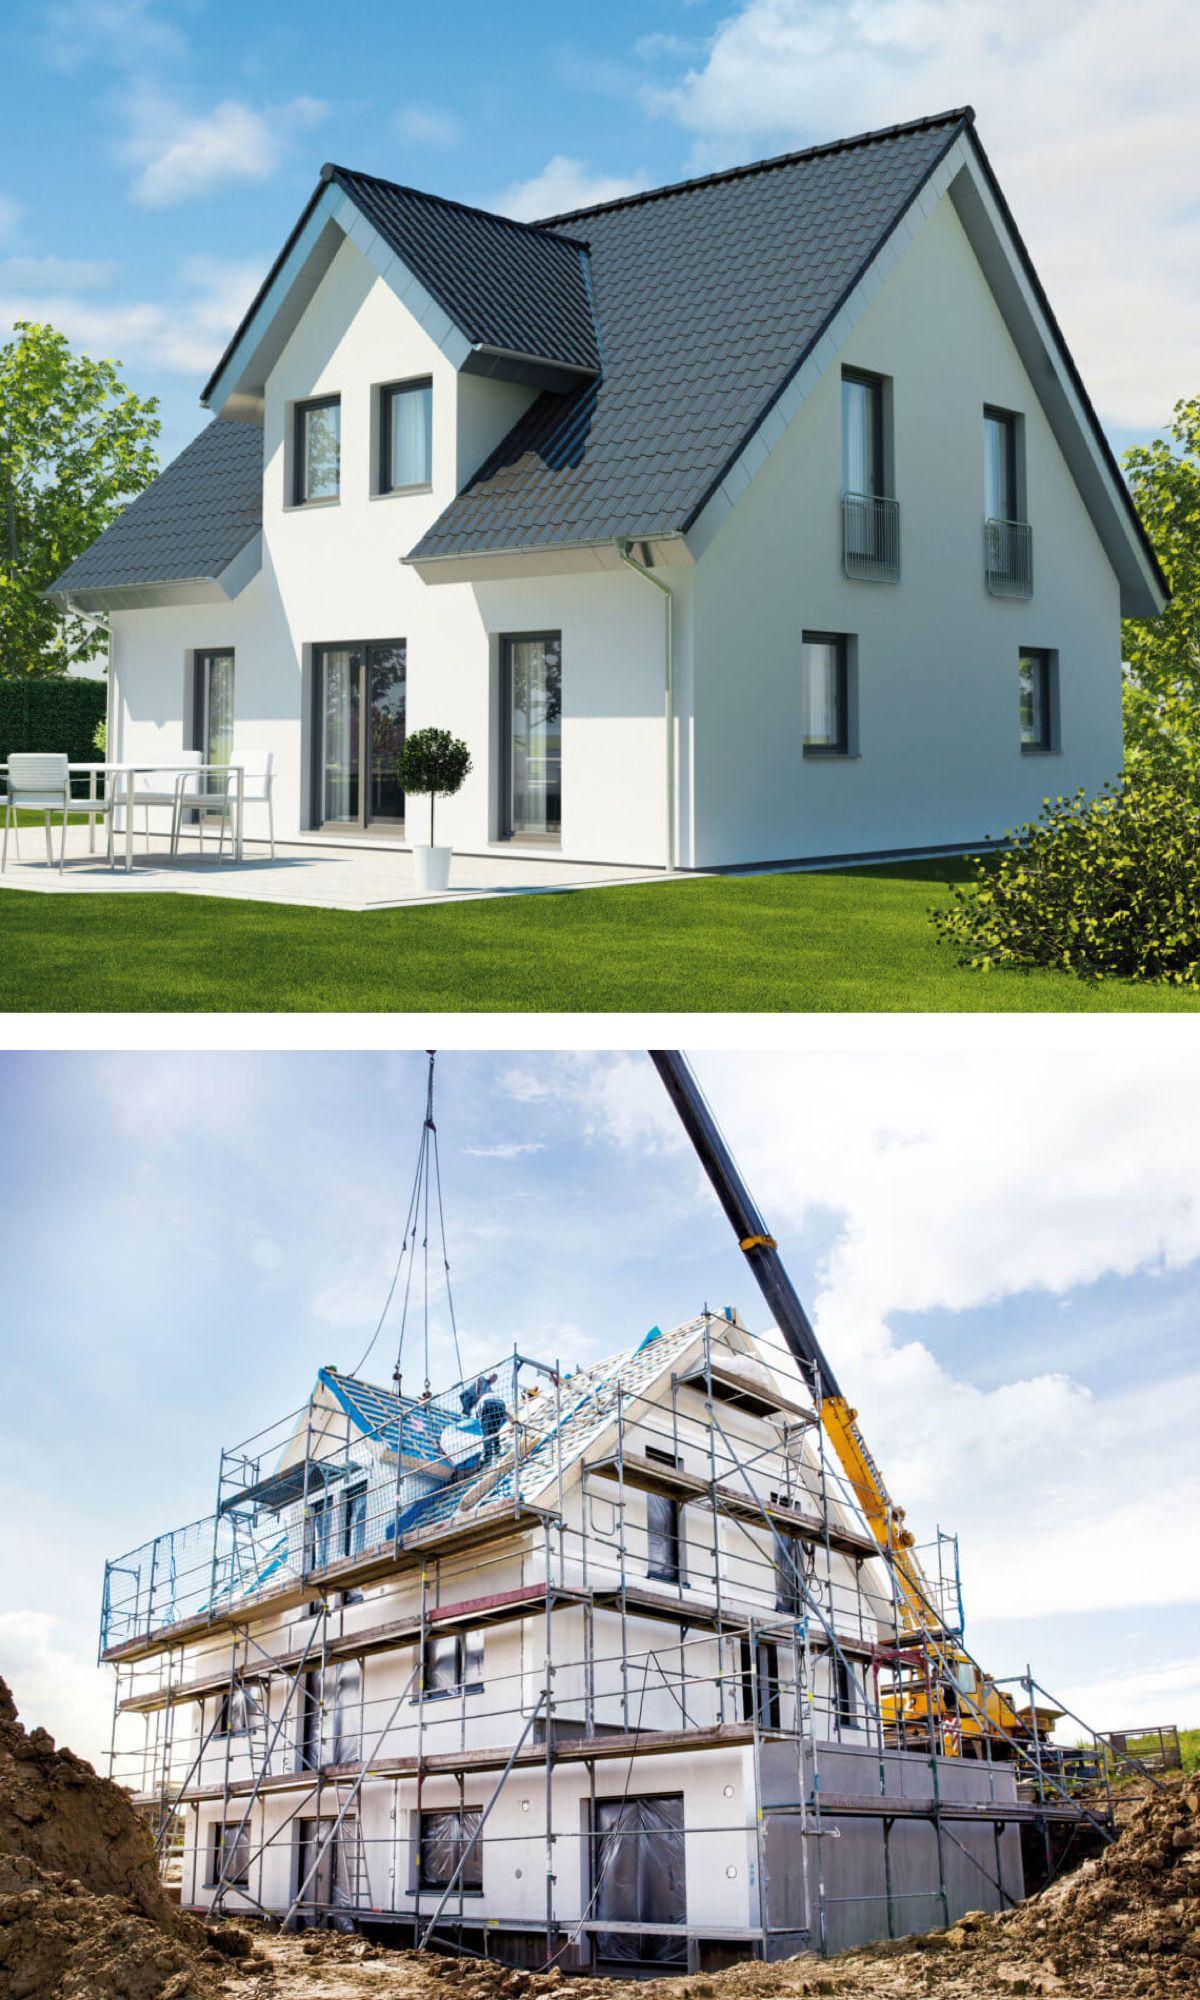 Individuelles fertighaus massiv bauen architektenhaus for Architektenhaus bauen